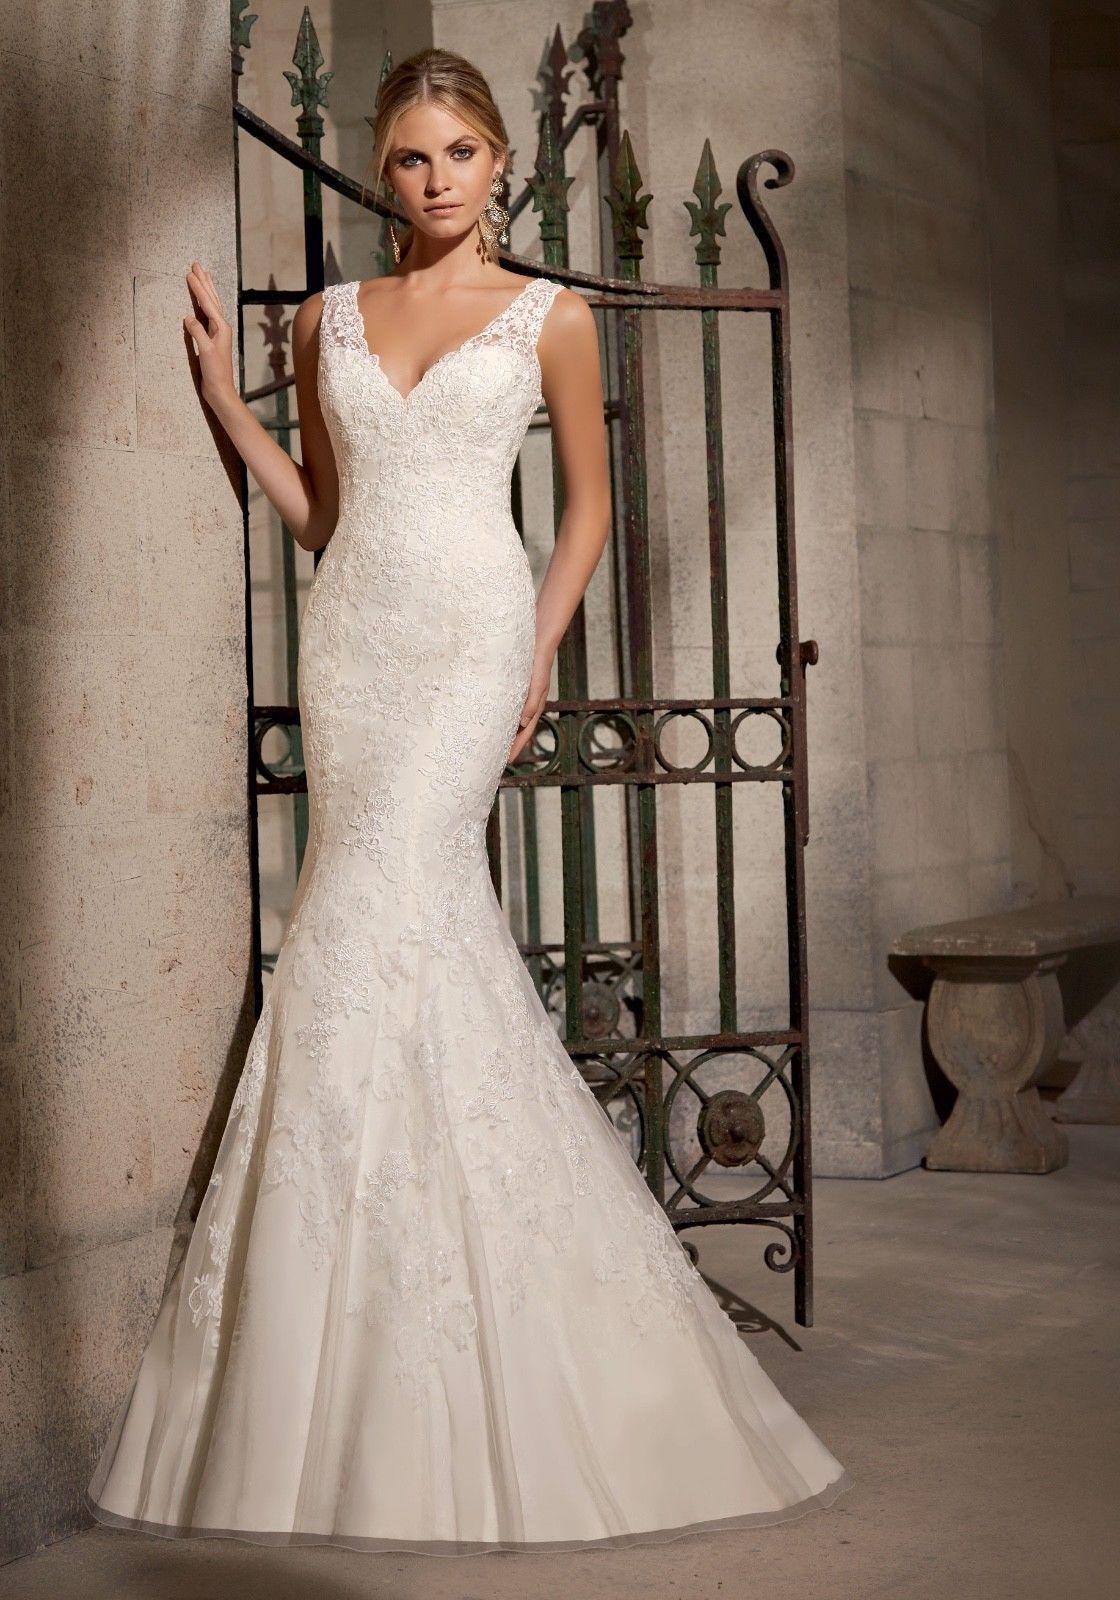 Brand new morilee wedding dressivory size chantilly lace style